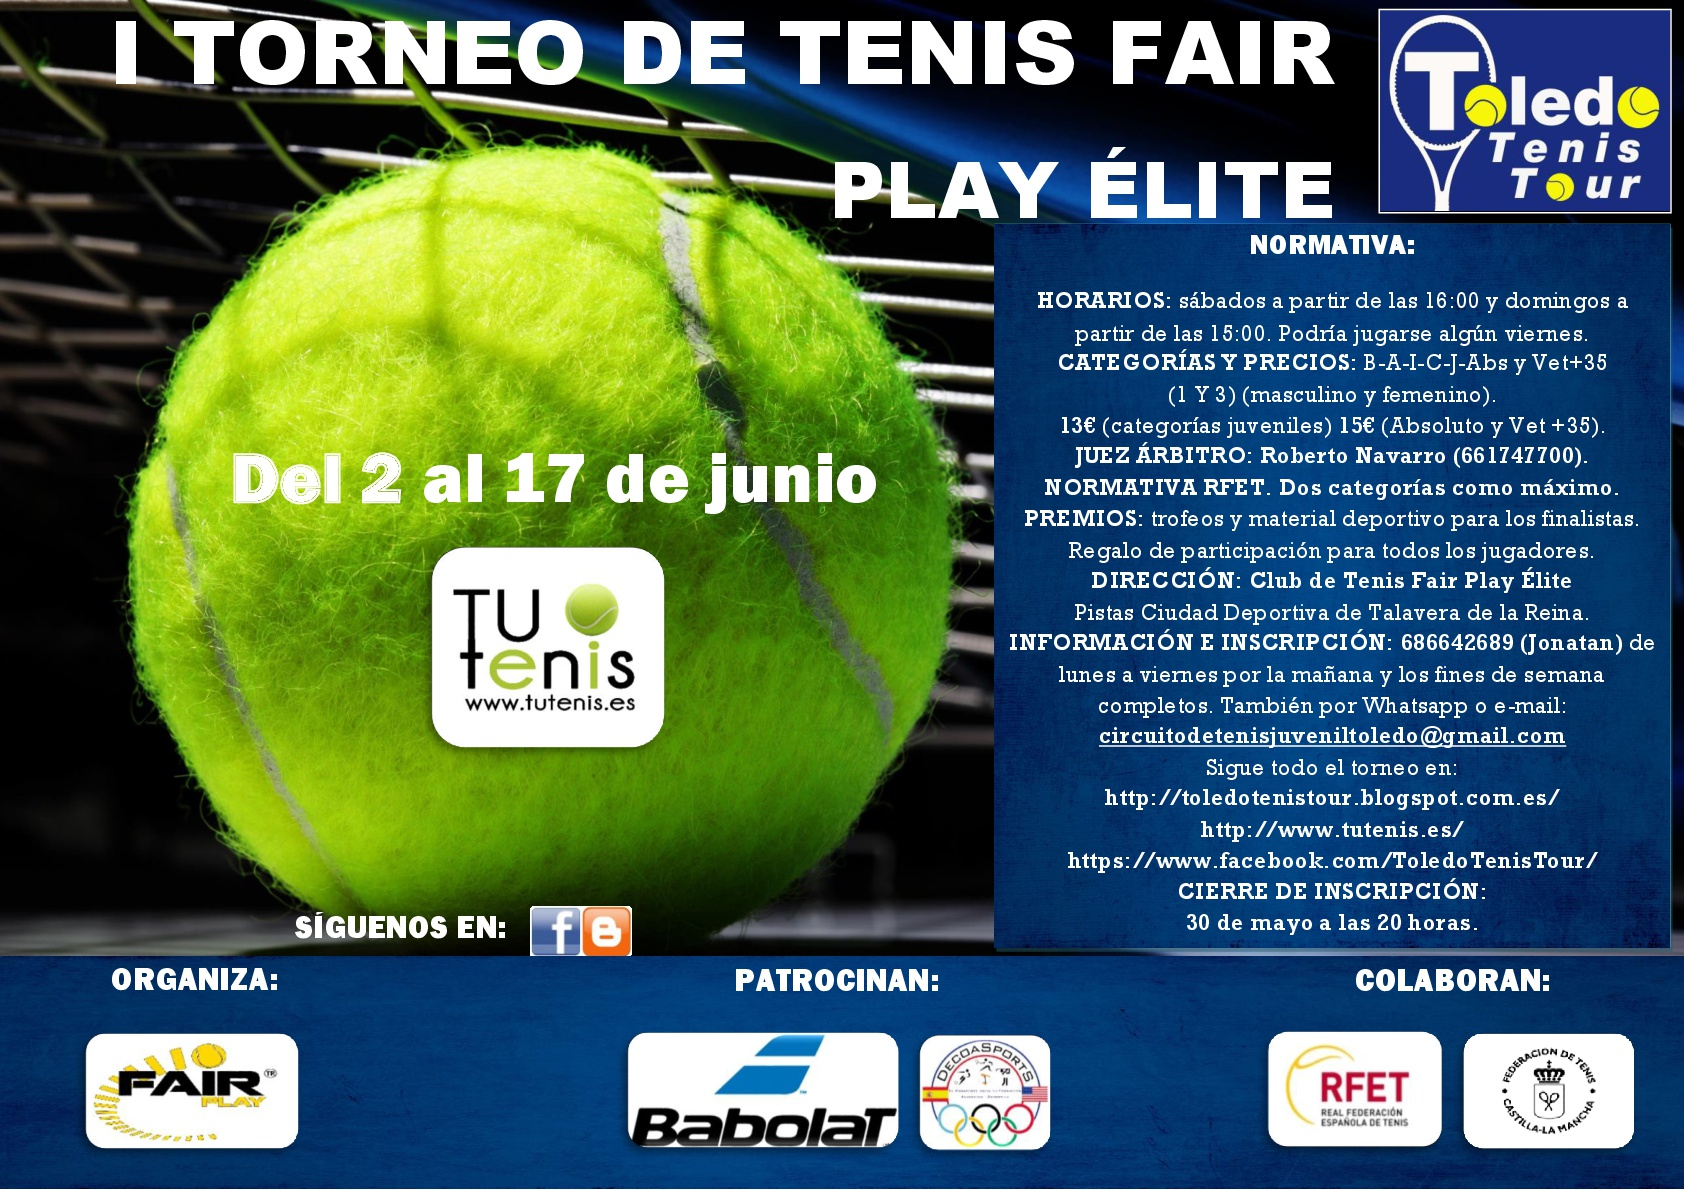 Cartel Torneo Fair Play Élite